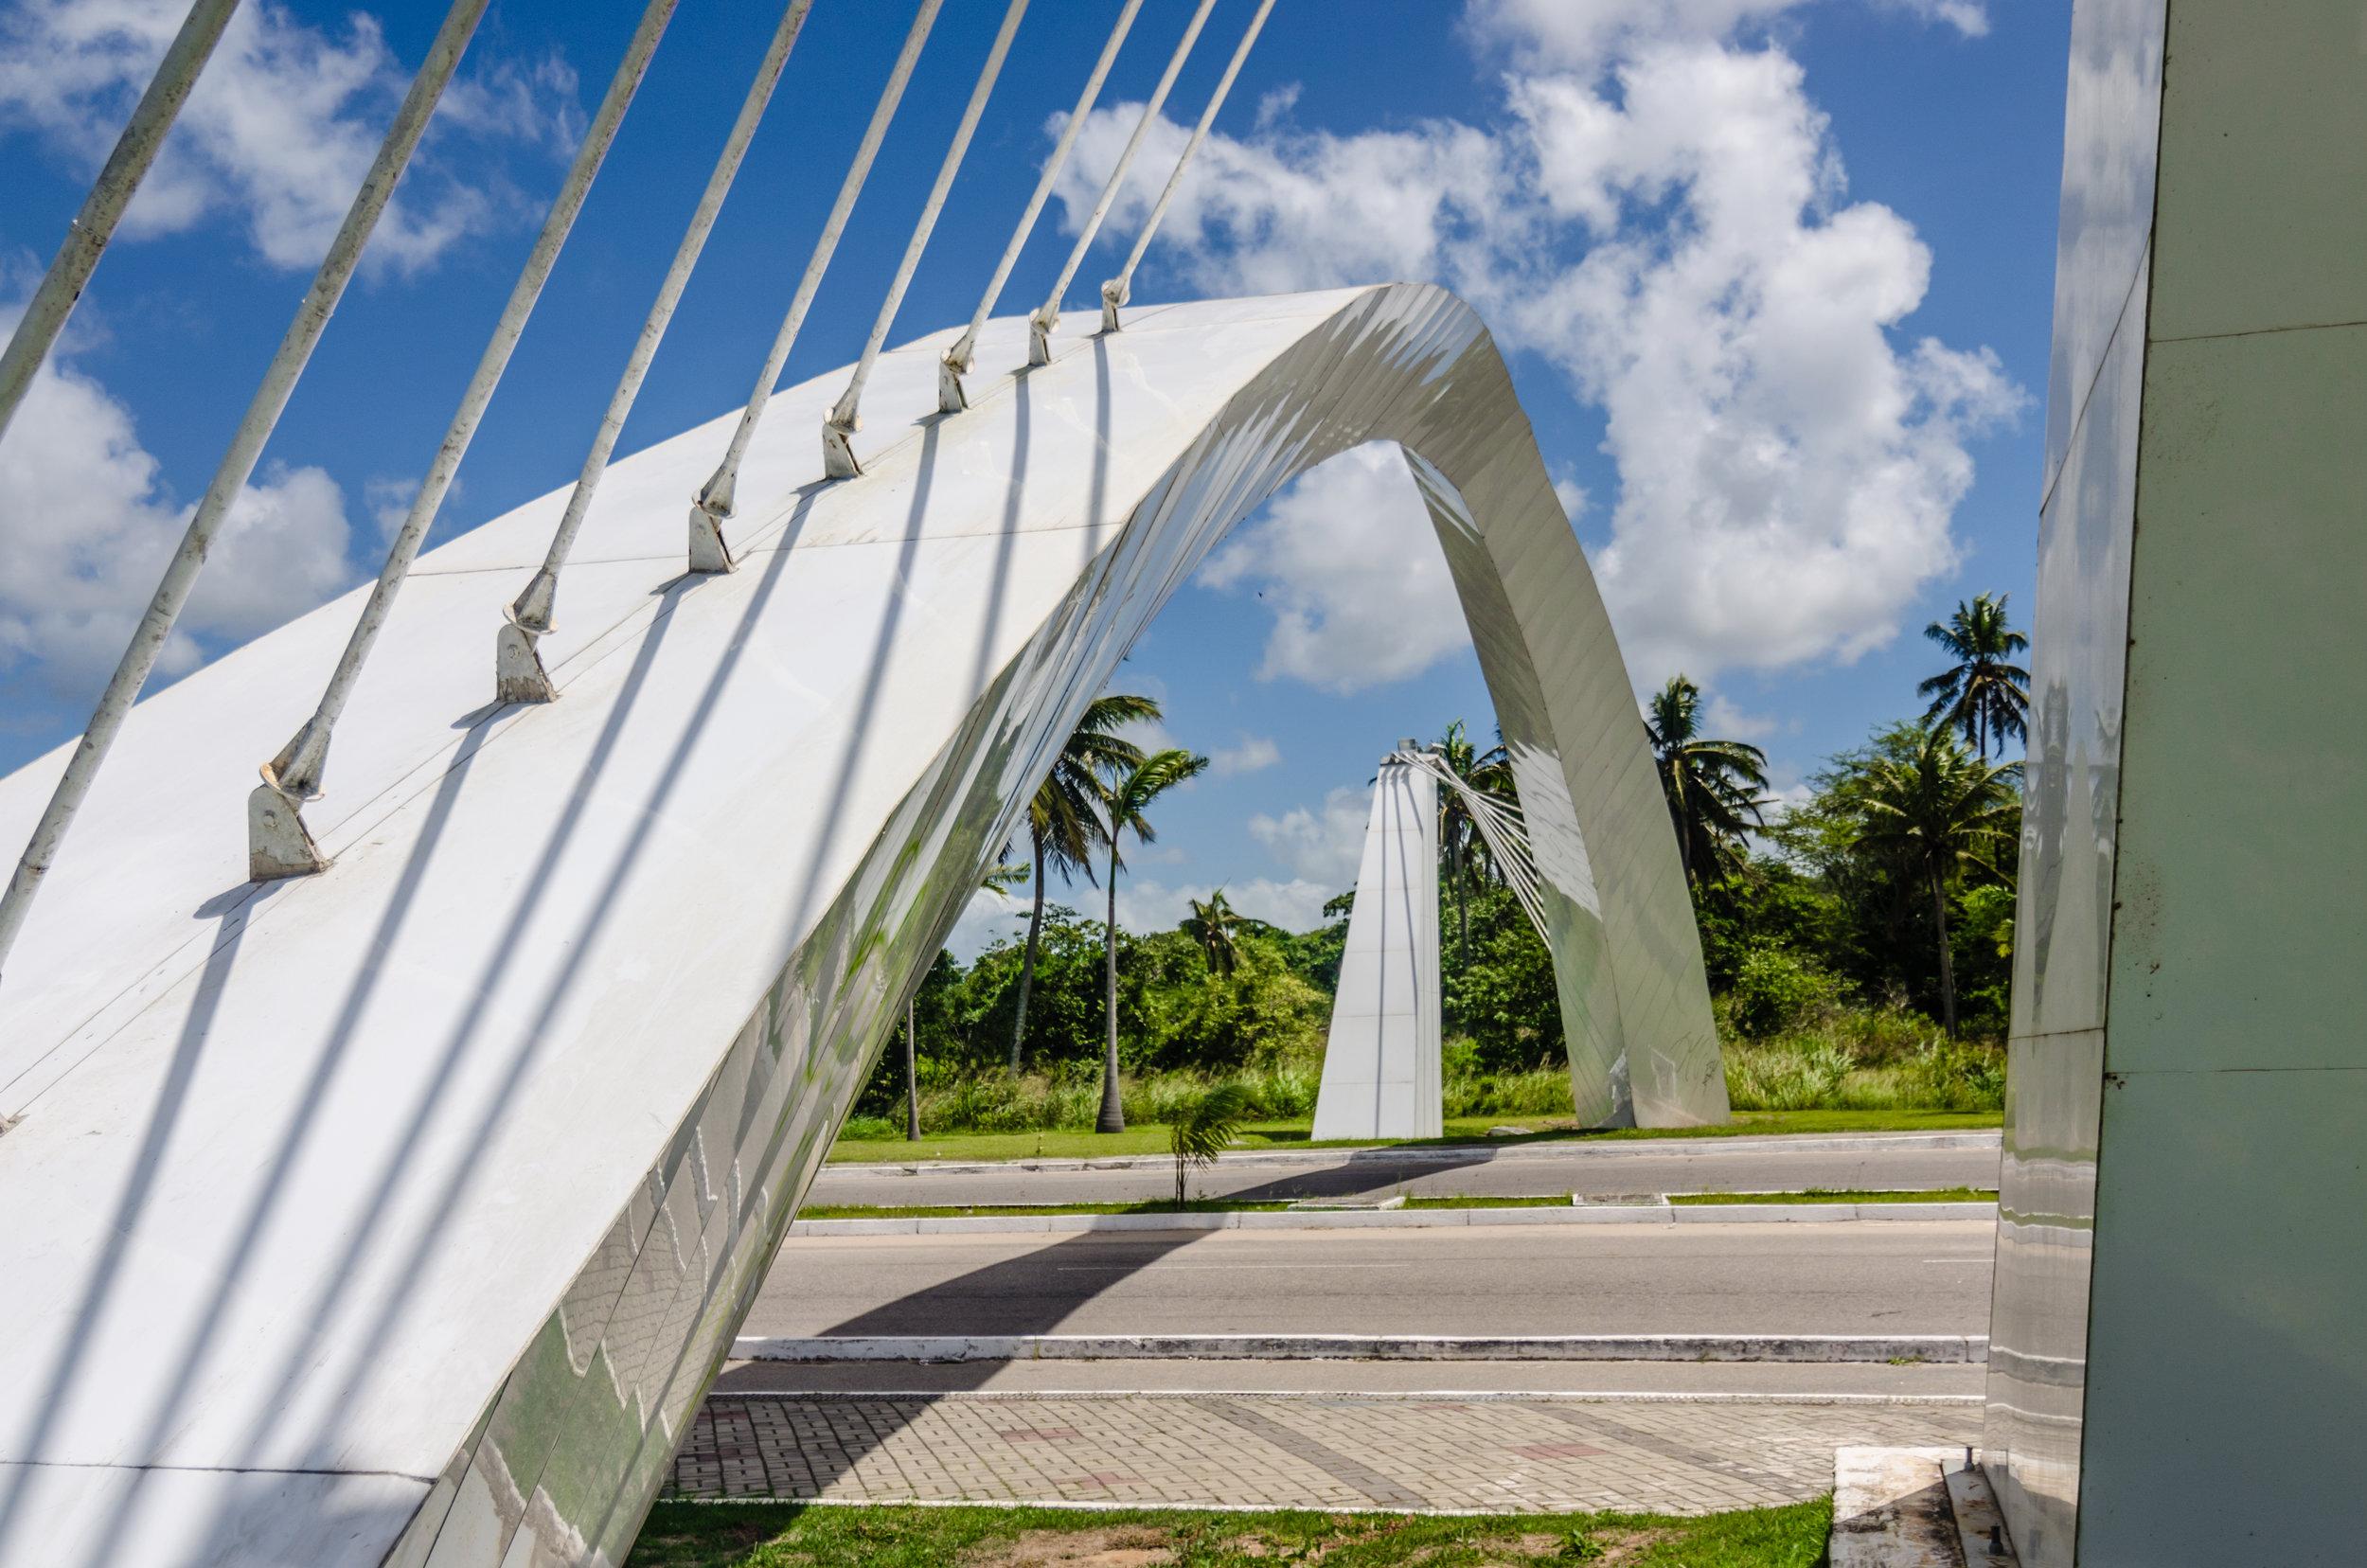 projeto-arquitetonico-portmacaiba-duo-arquitetura-urbanistico-02.jpg